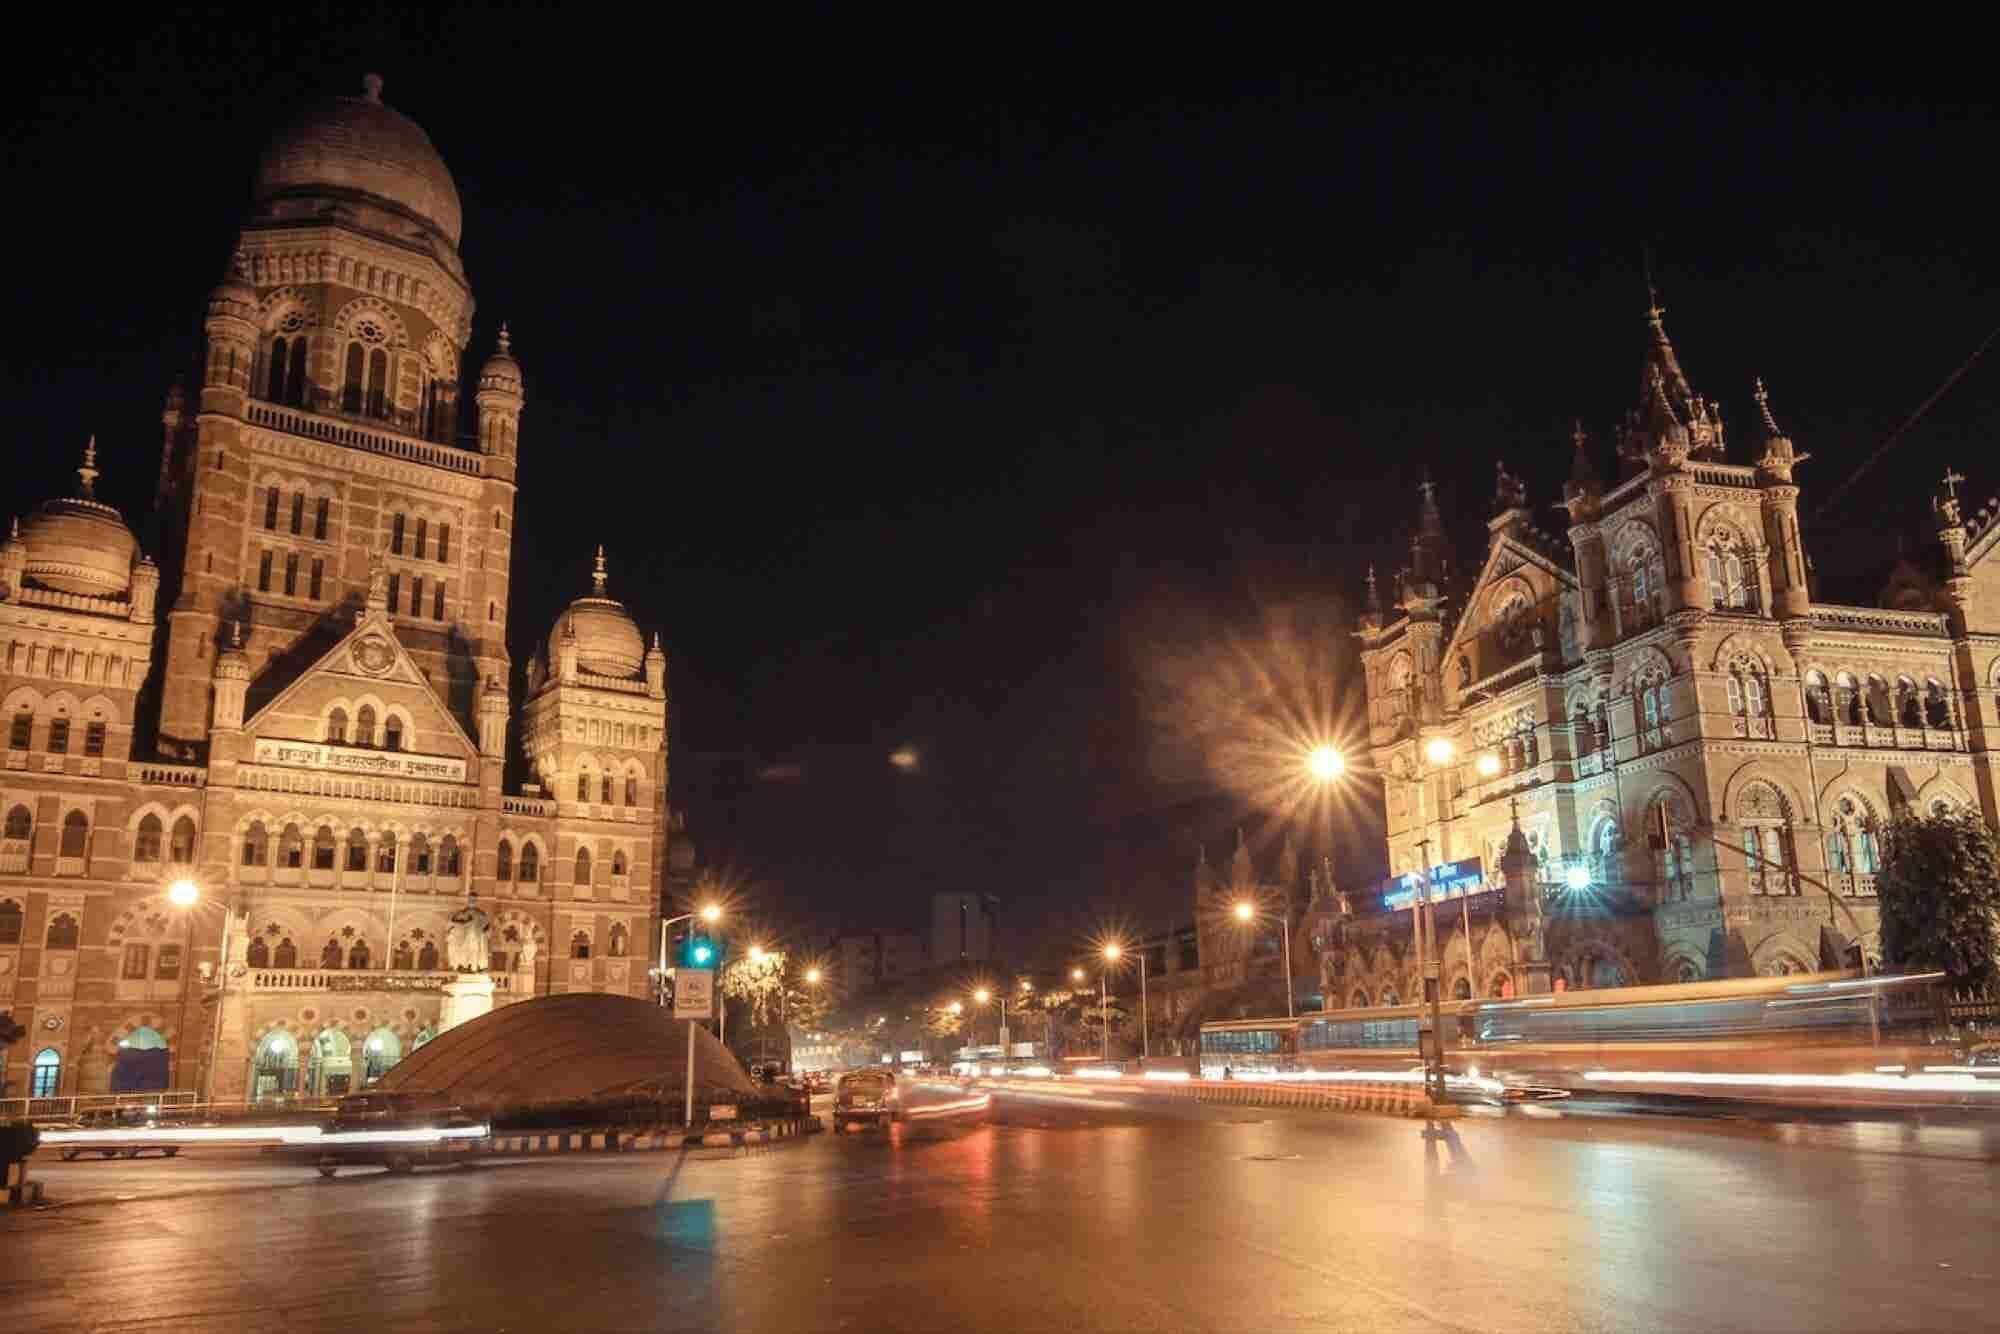 UAE-India Economic Forum Aims To Strengthen Economic Ties Between Nations